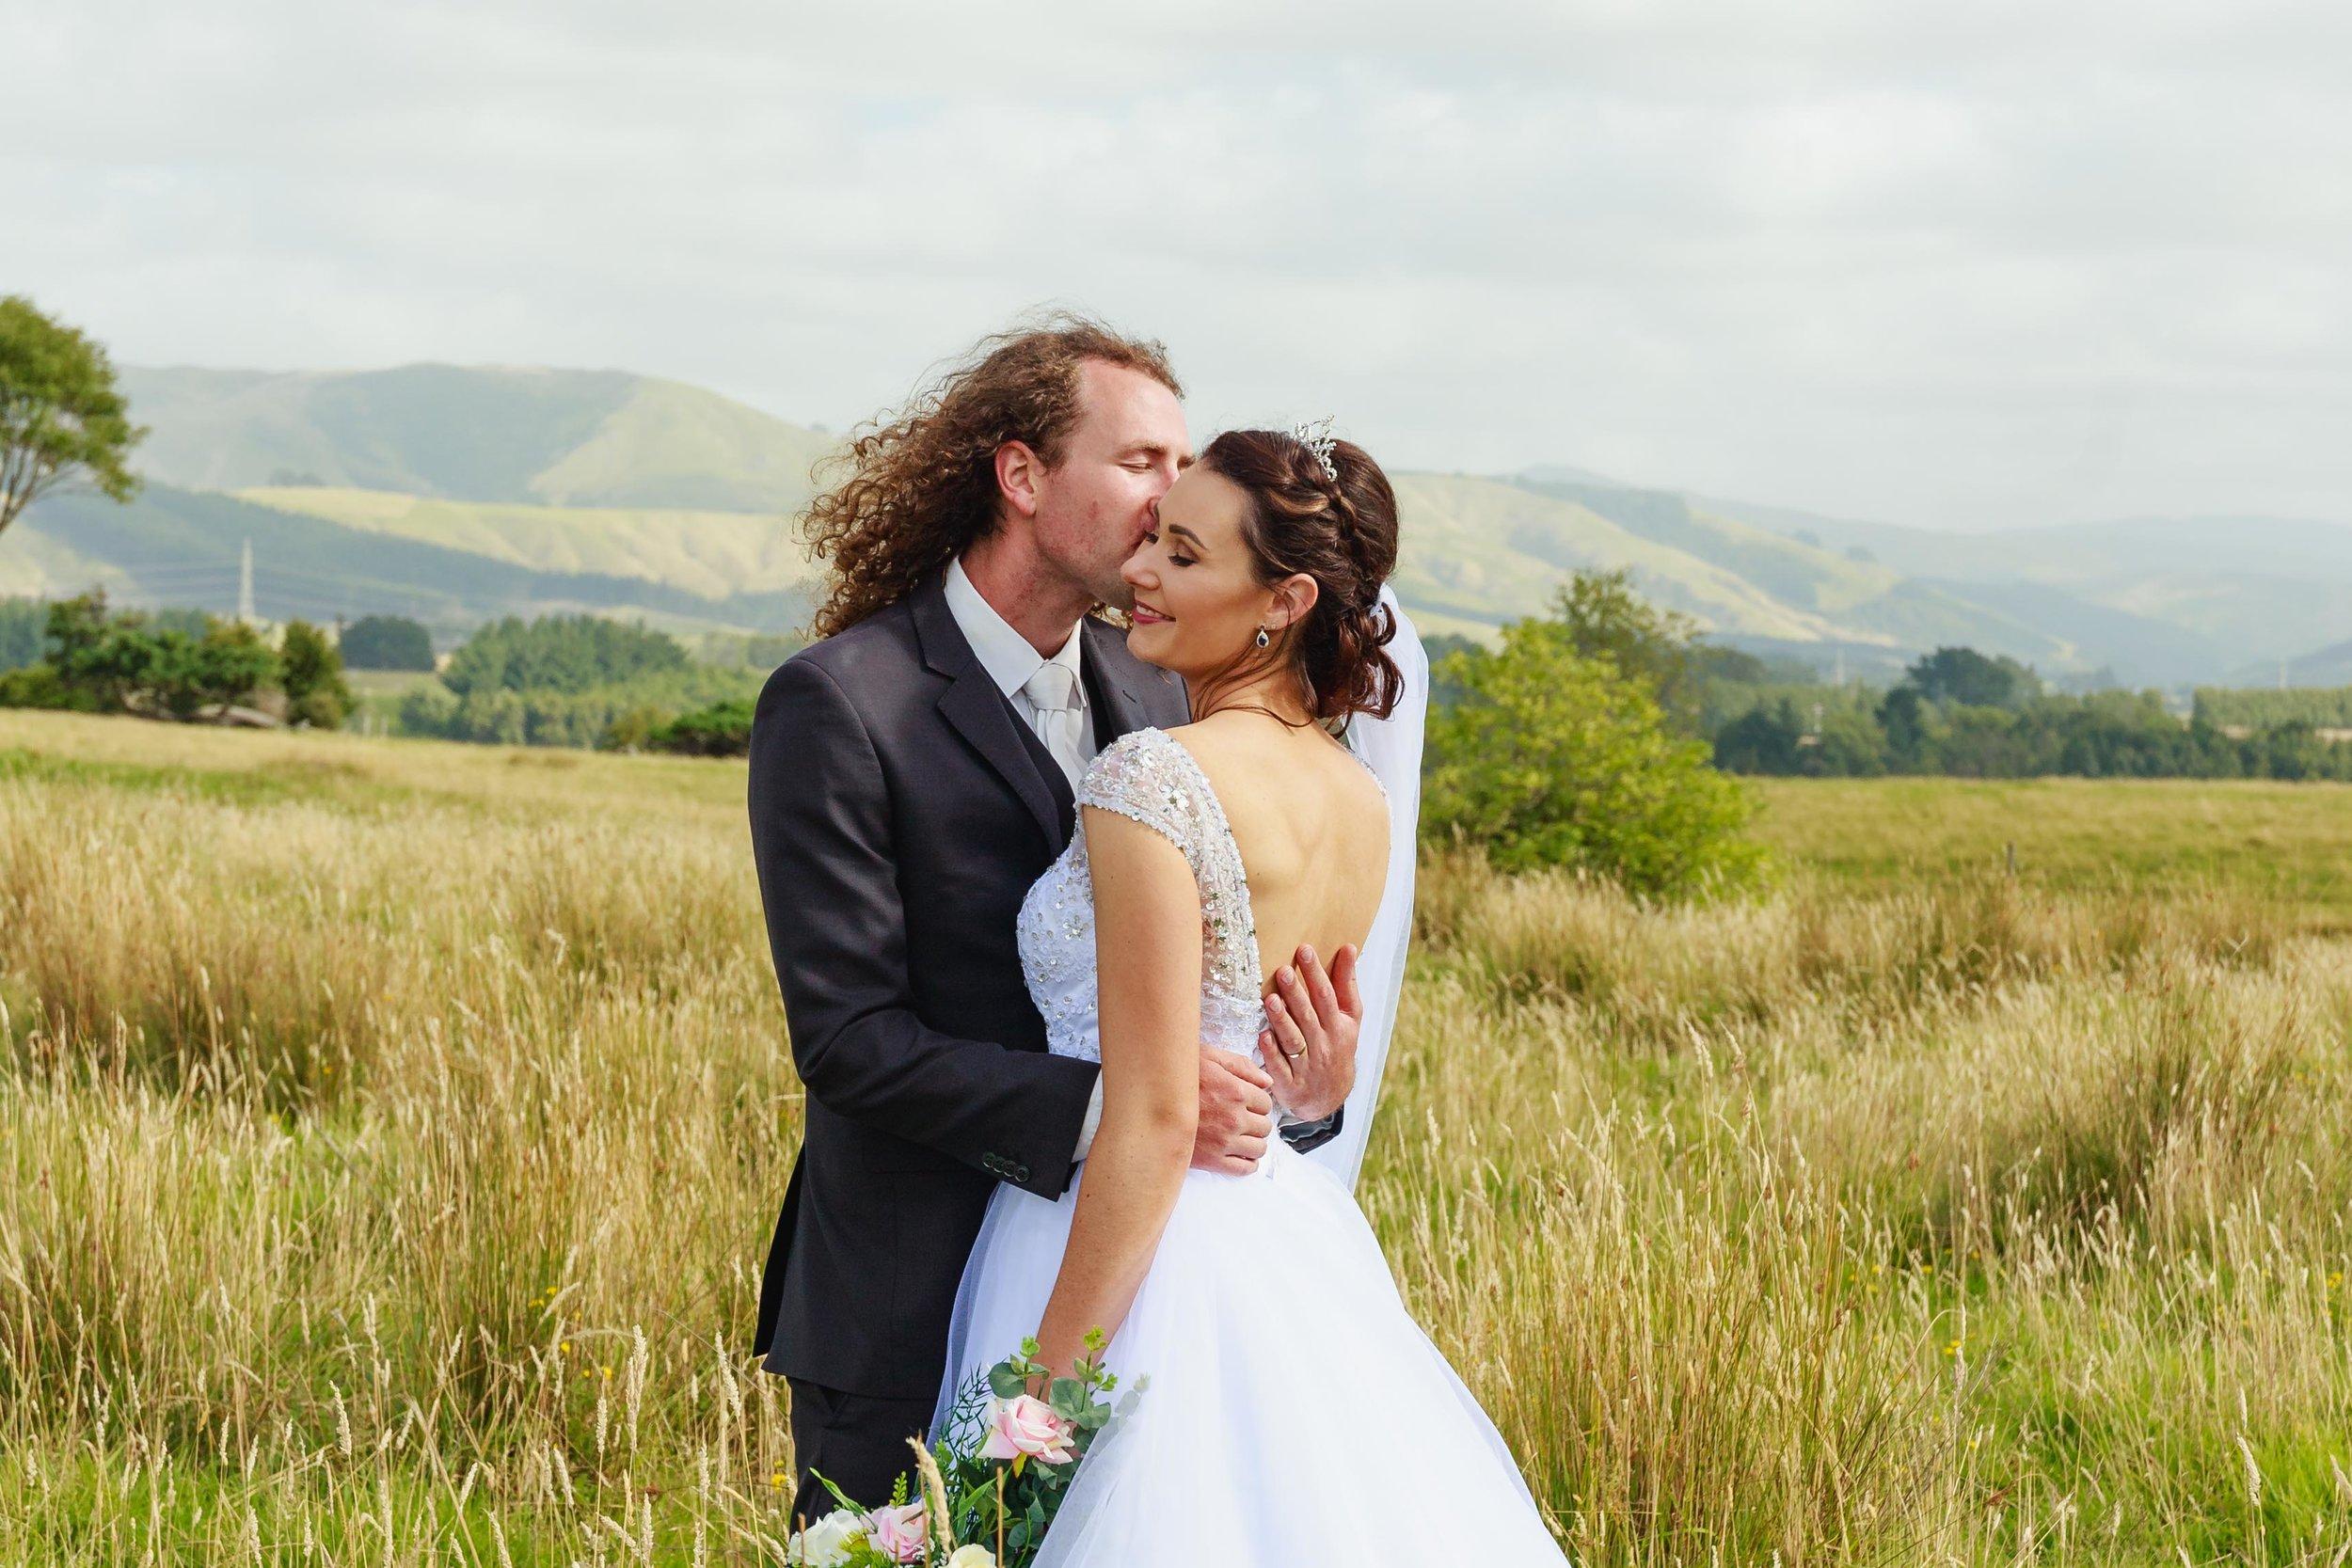 the-chalet-highlight-wedding-photography-palmerston-north-128.jpg